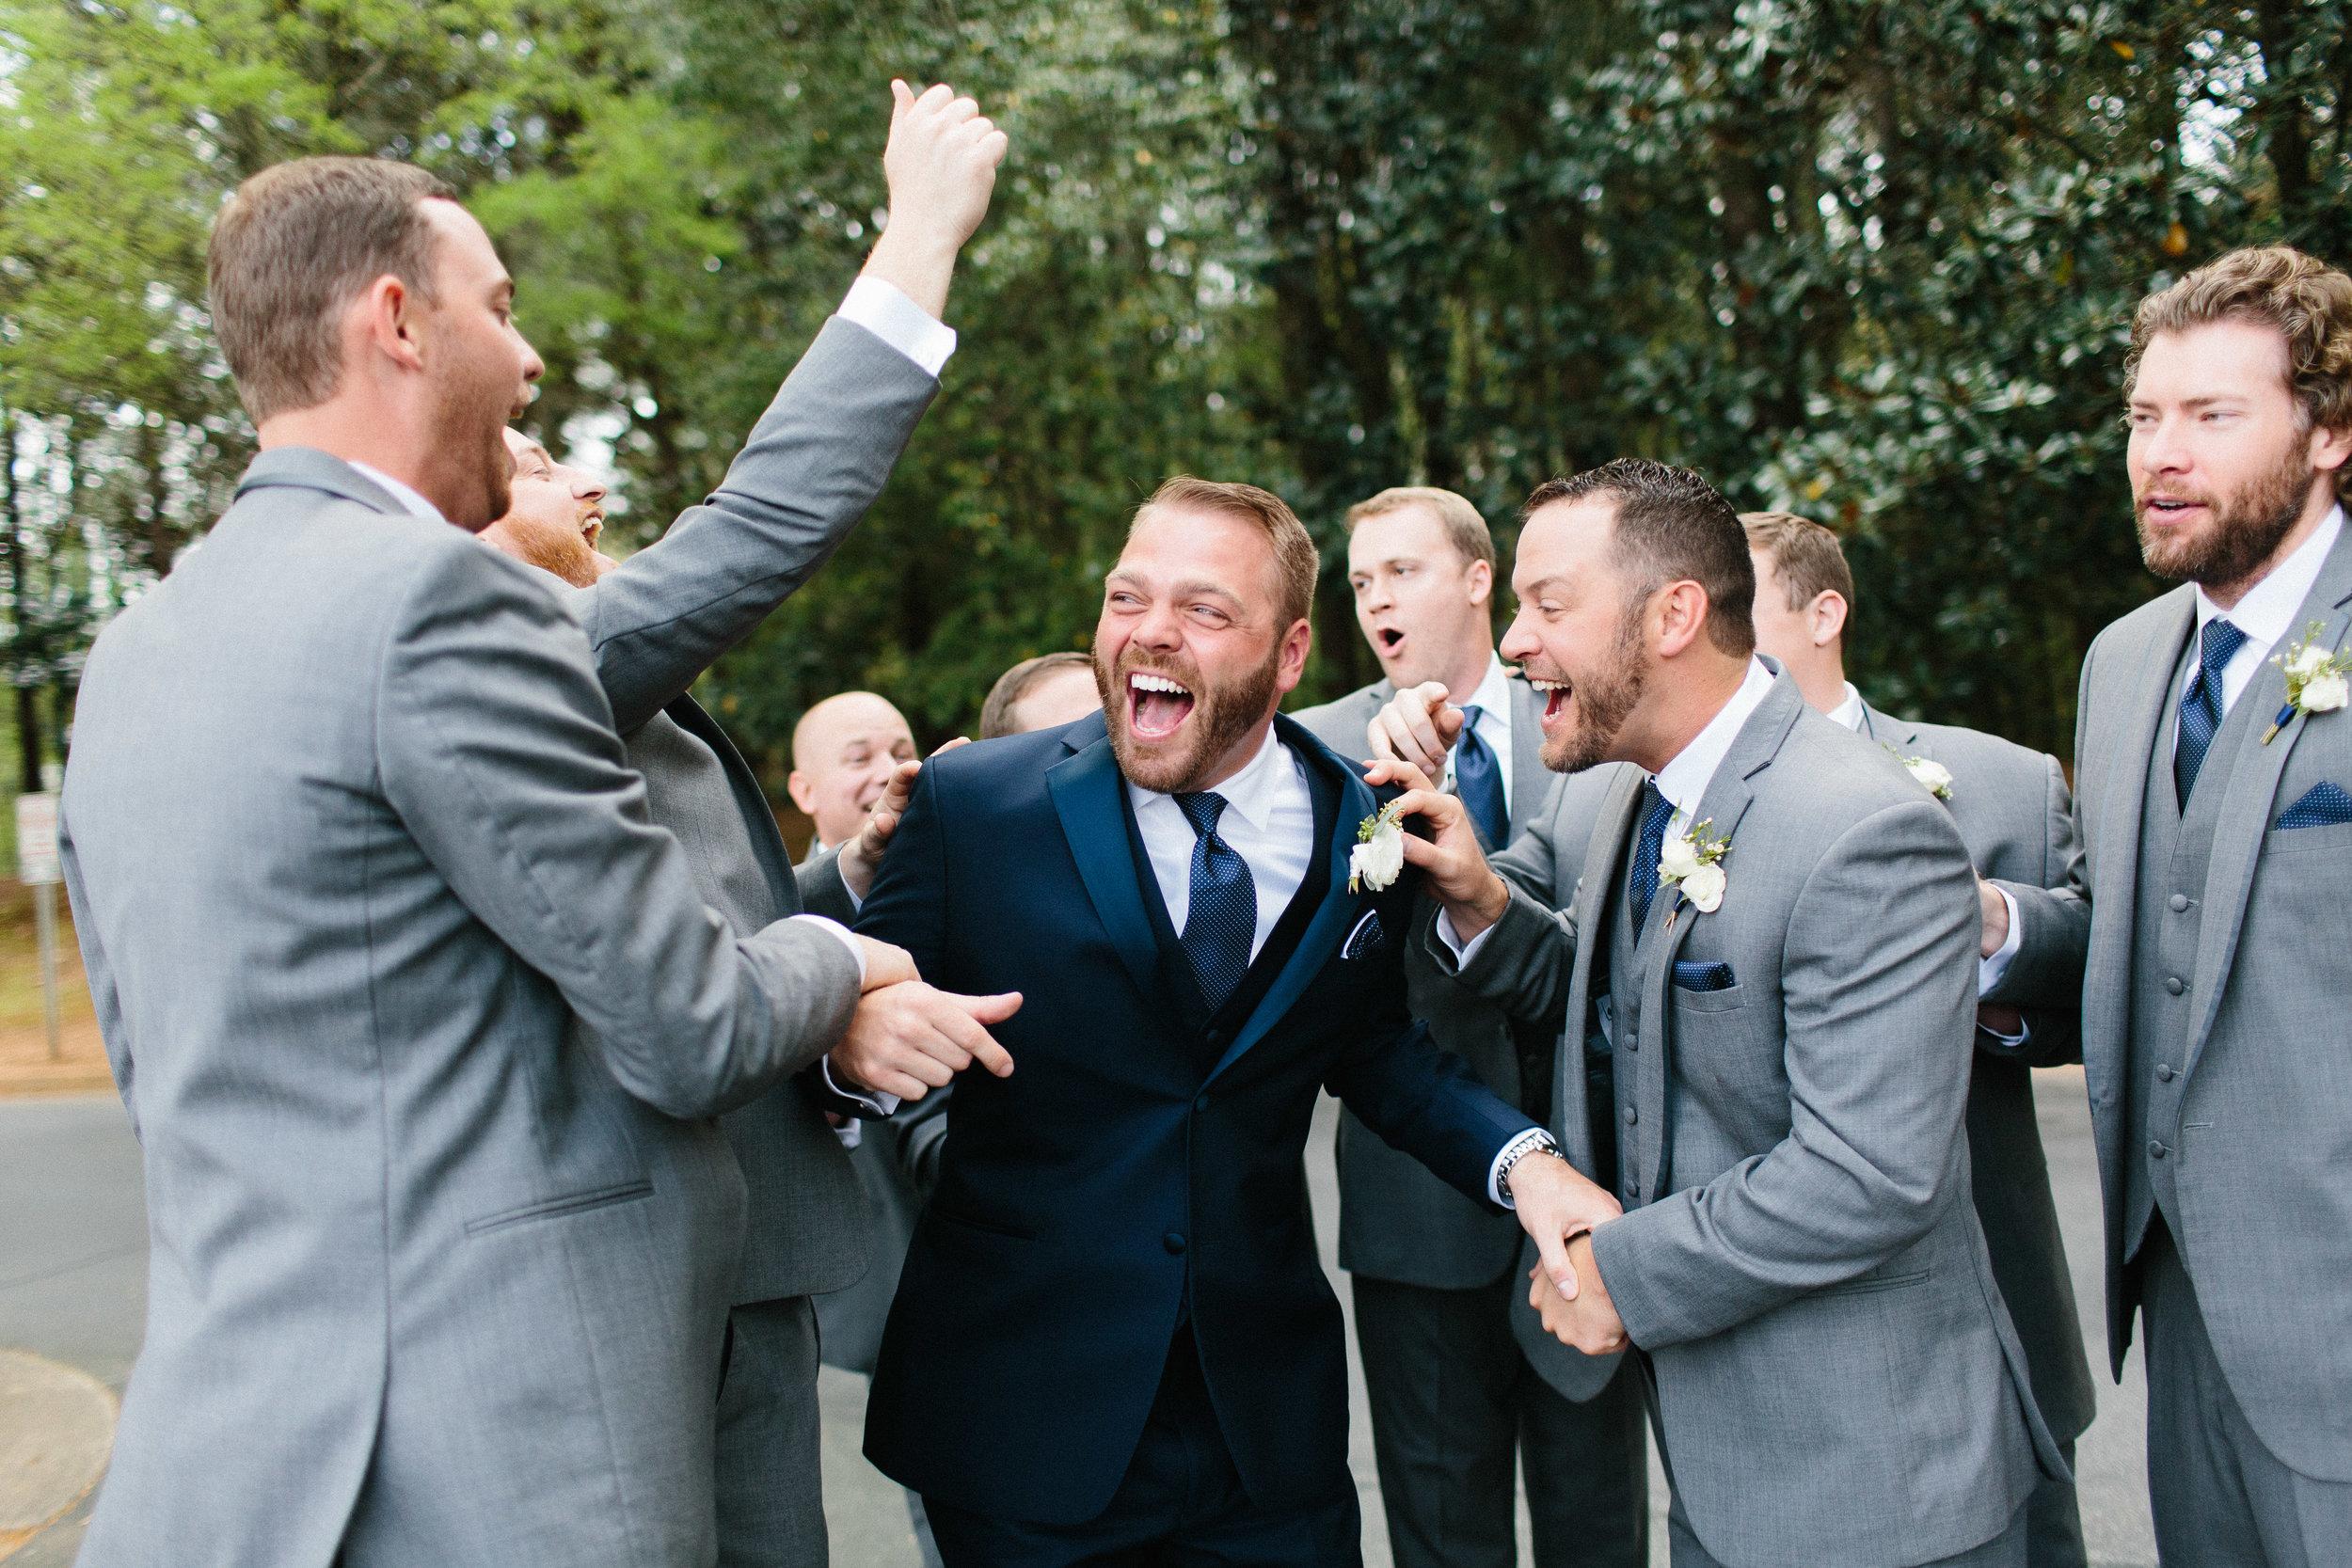 roswell_st_peter_chanel_catholic_avalon_hotel_alpharetta_wedding-1325.jpg